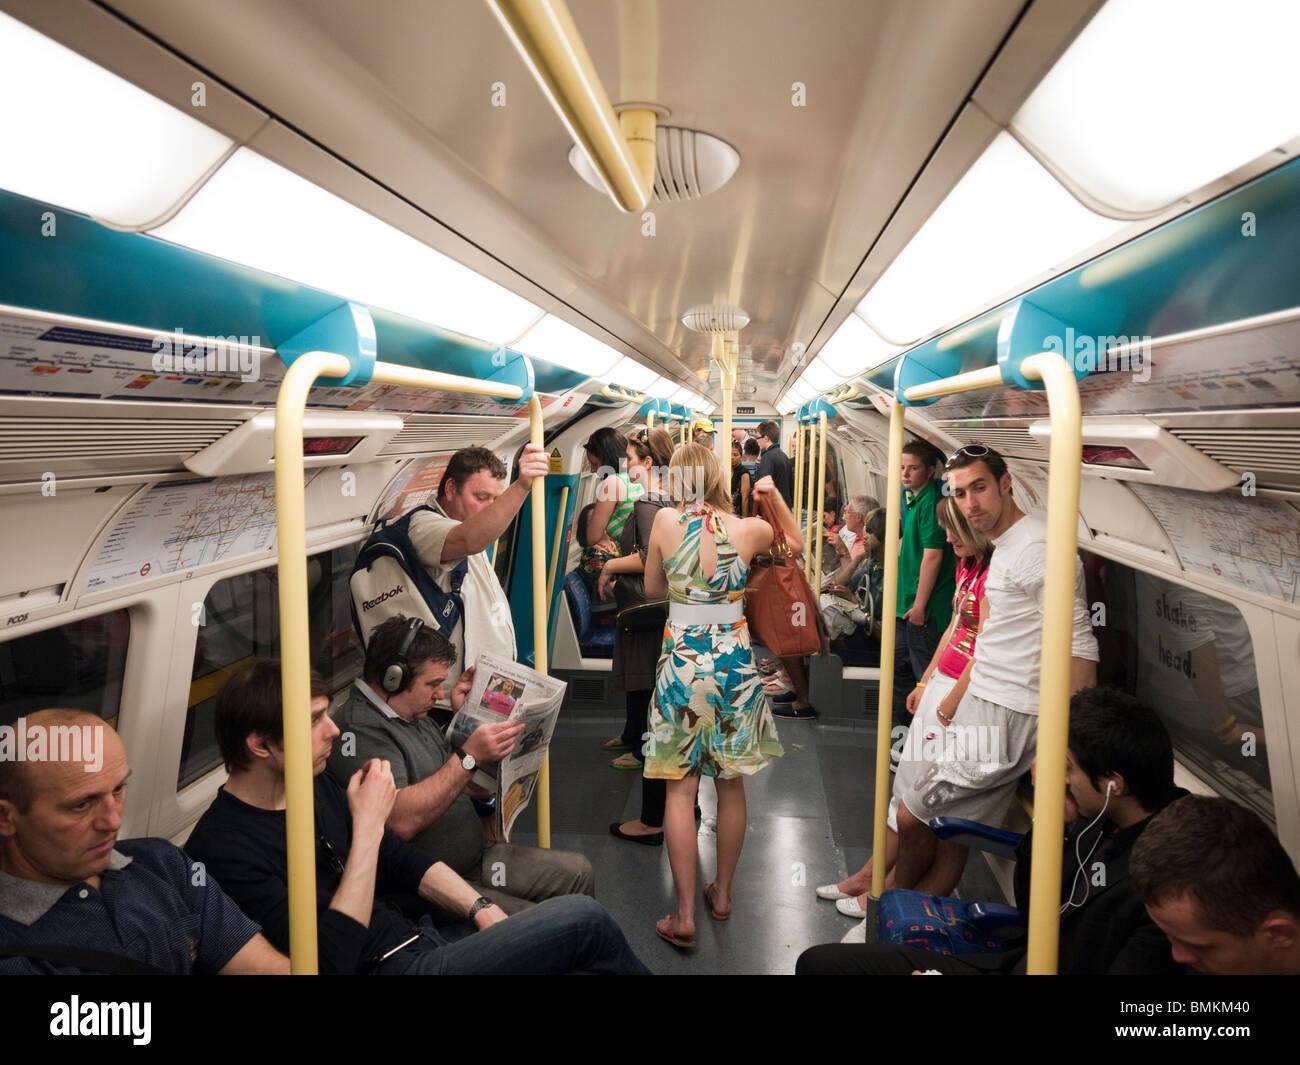 Interior of London Underground train - Stock Image